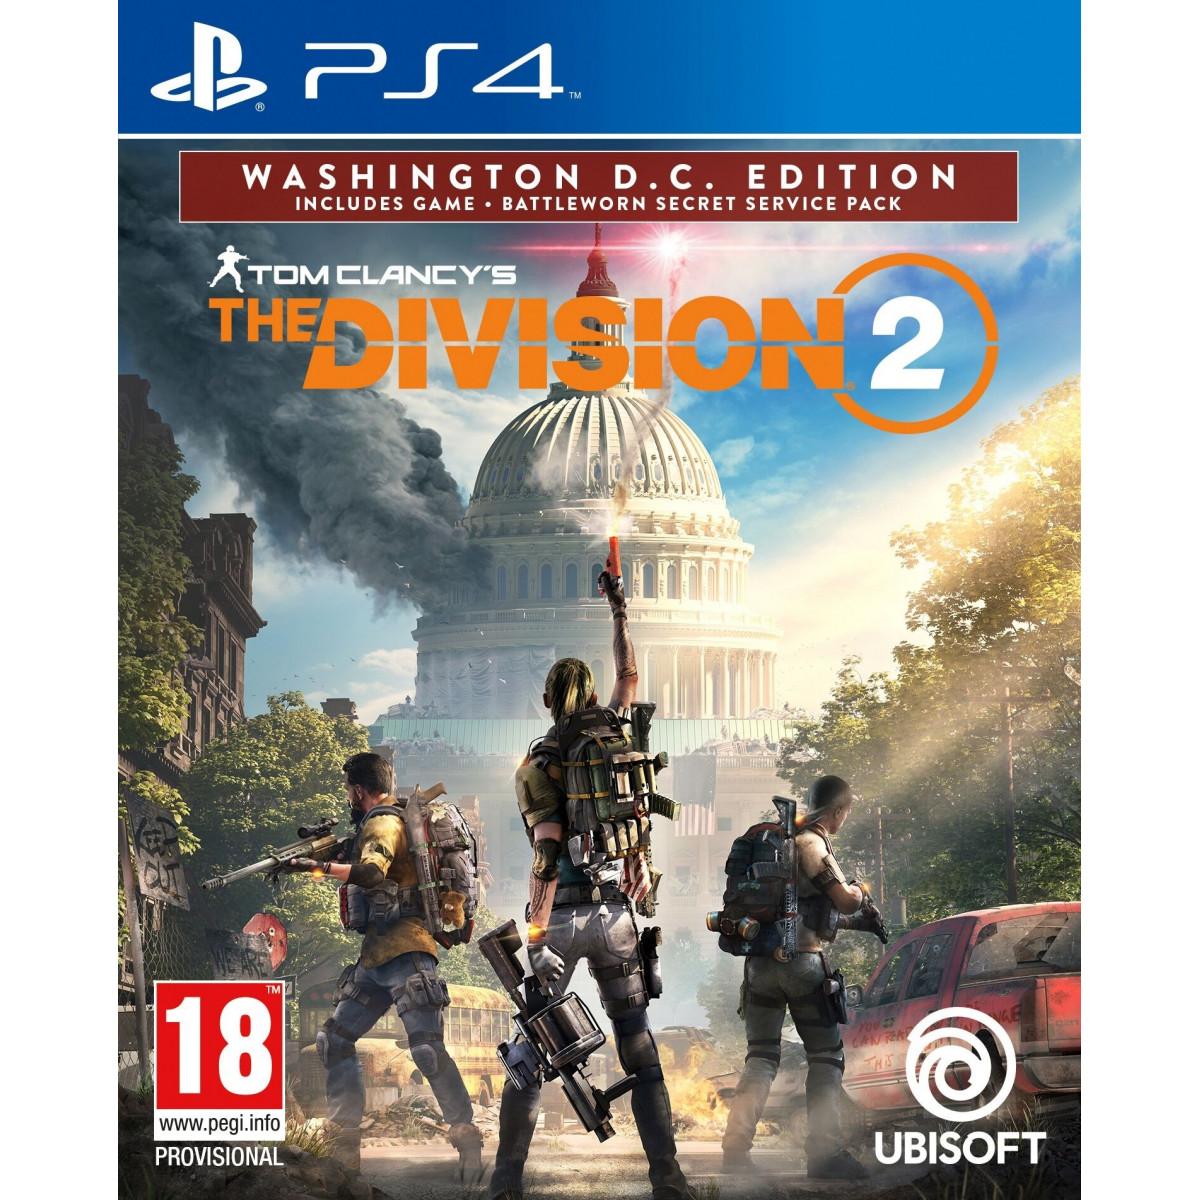 The Division 2: Washington D.C Edition